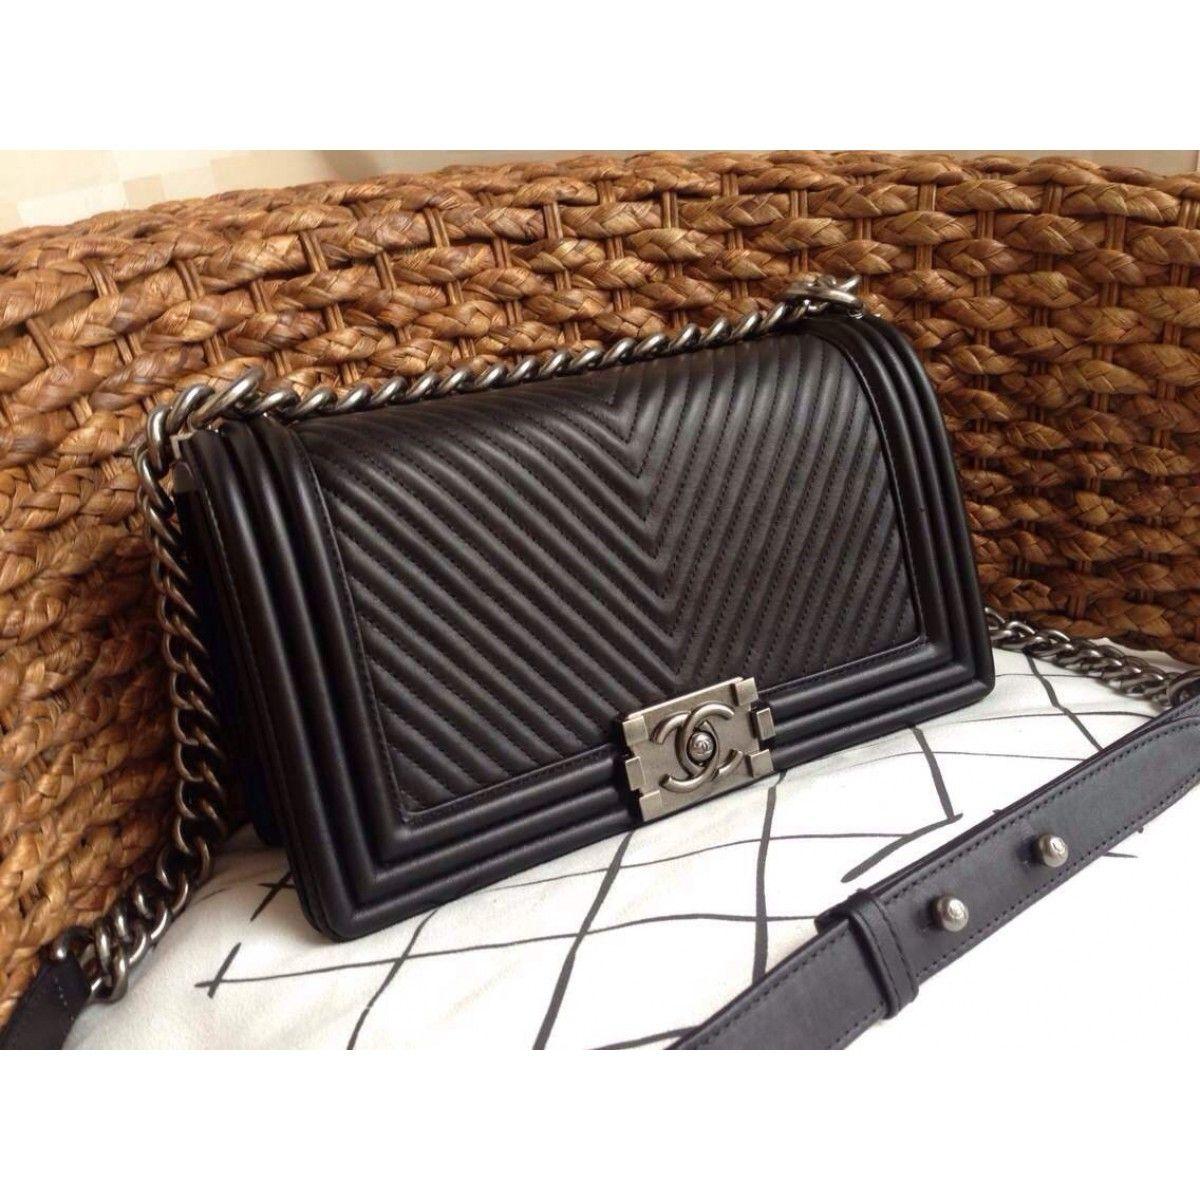 cc158208a52d Chanel Micro Chevron Boy Bag - Black | bags. in 2019 | Bags, Chanel ...